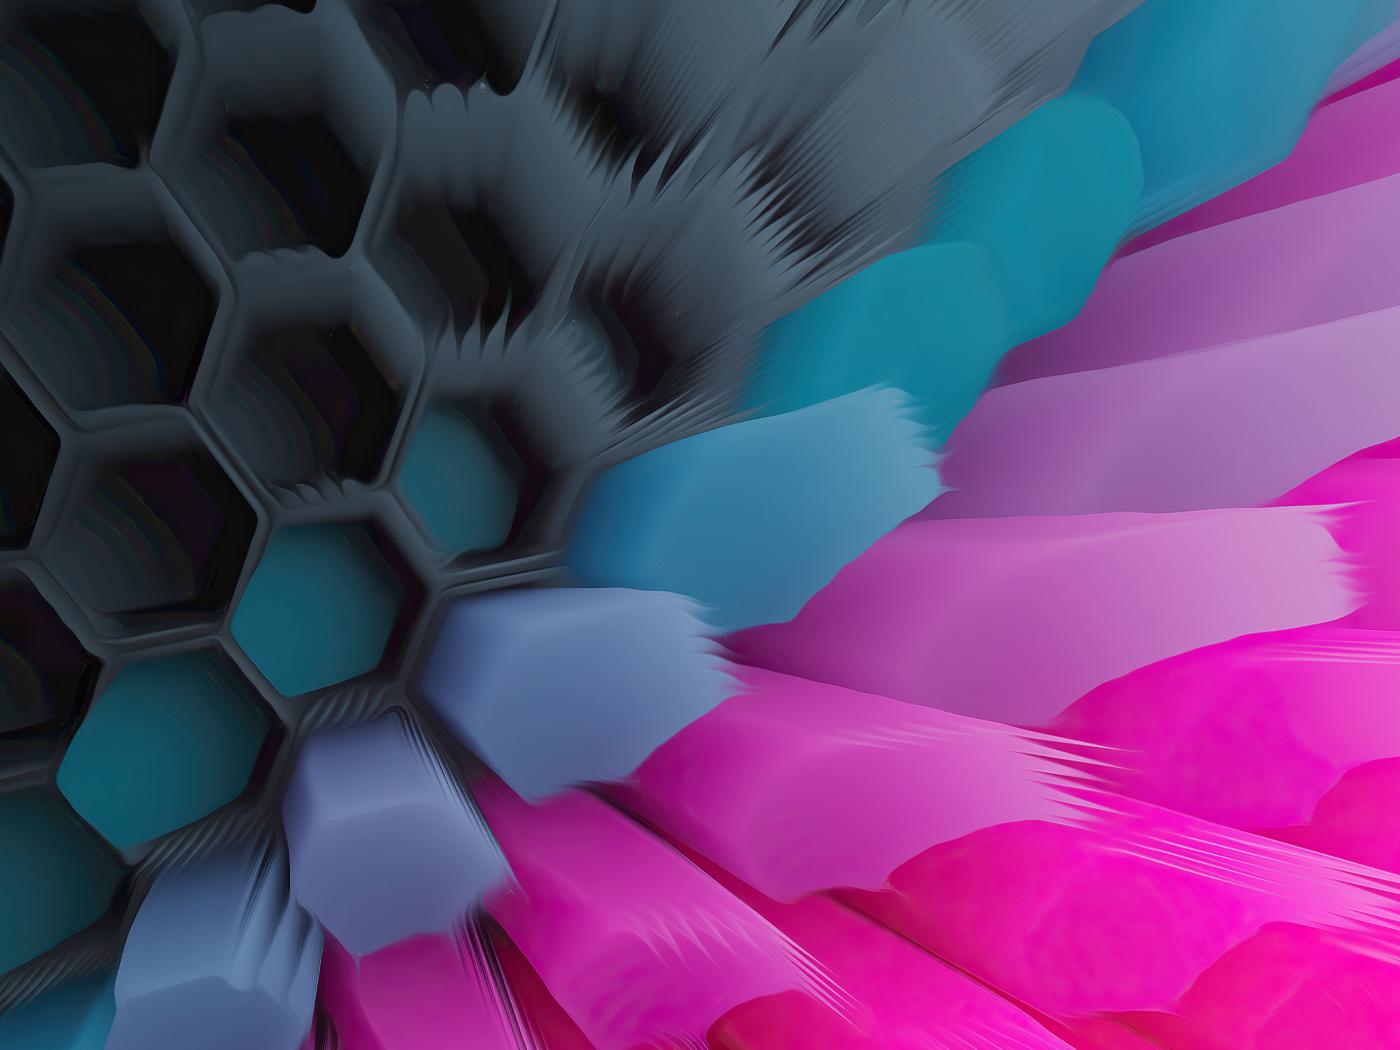 Pink Blue 4K Hexagon Wallpaper in 1400x1050 Resolution